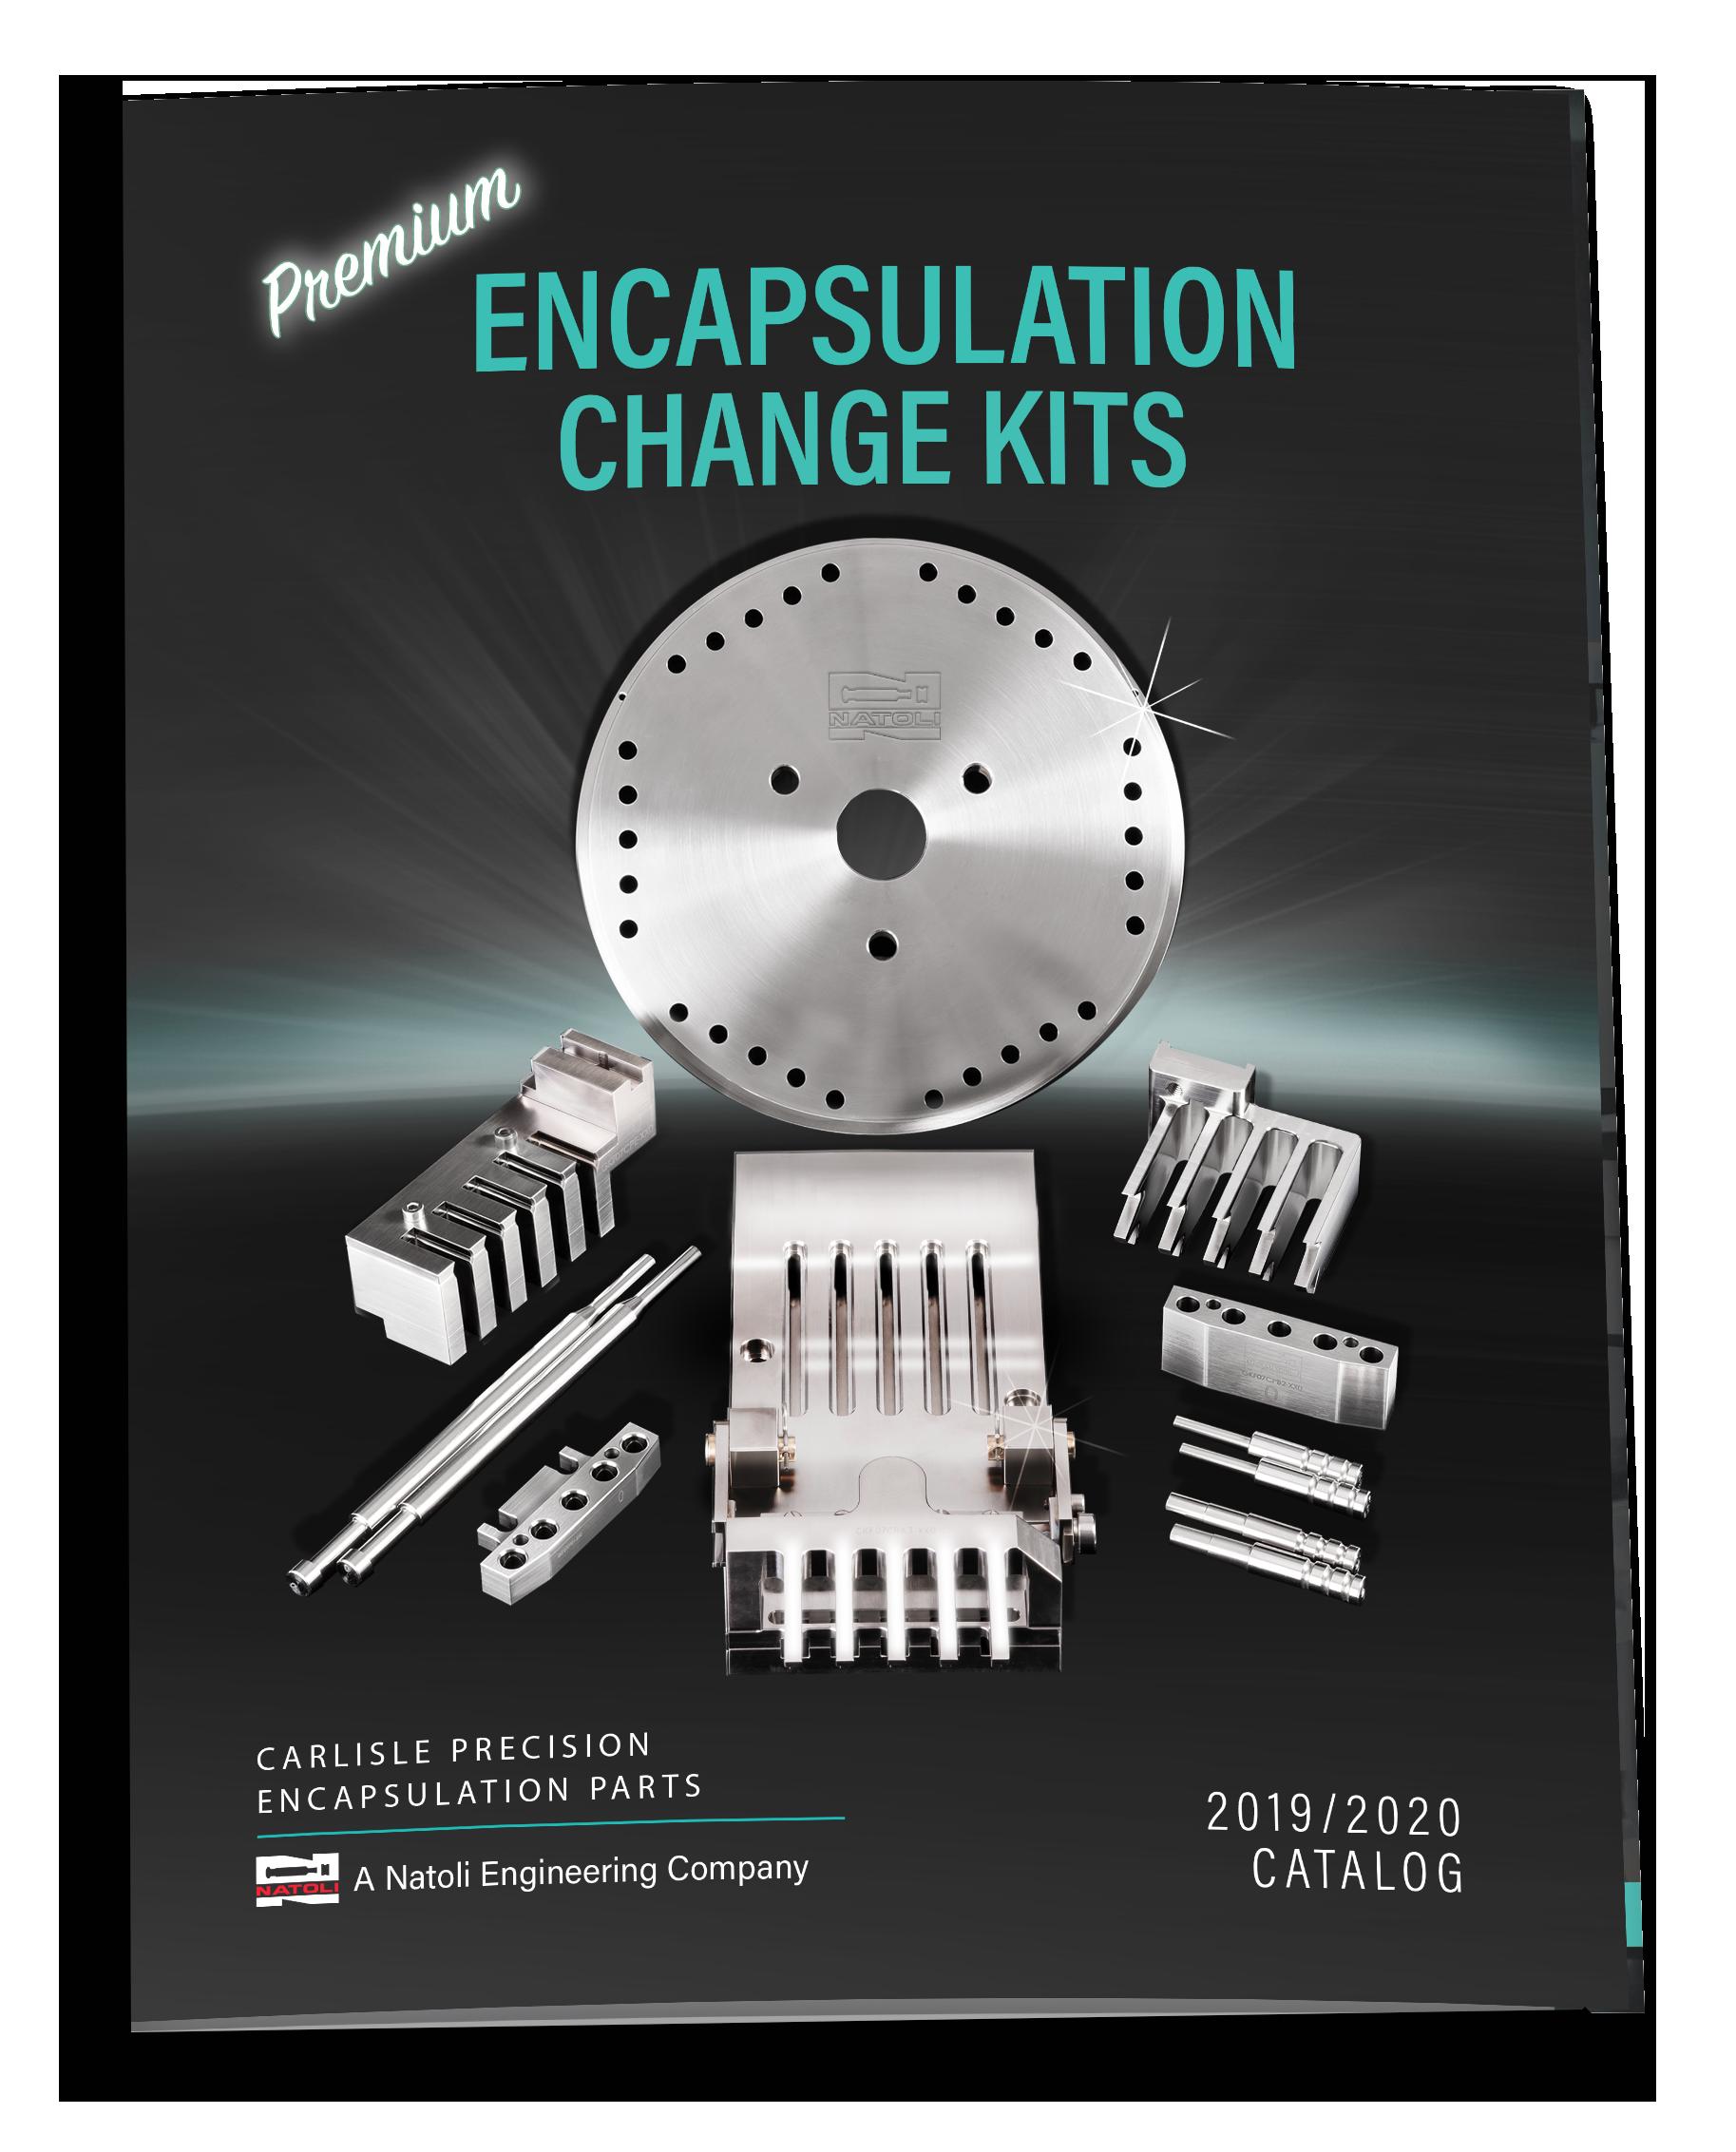 Encapsulation Kits Catalog